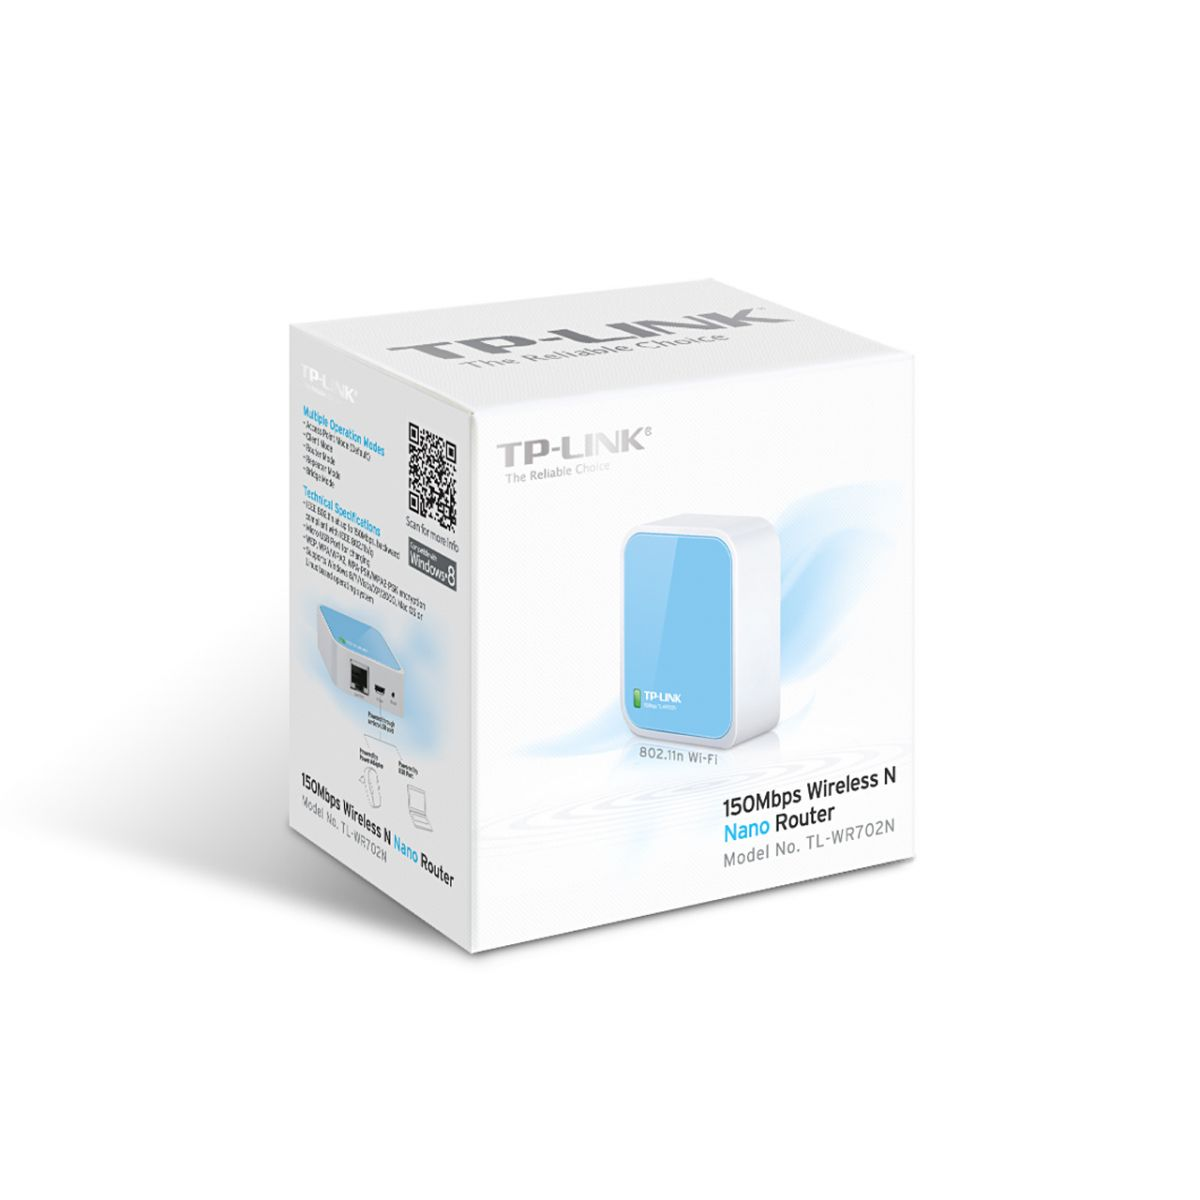 Roteador Portatil TP - Link Wireless N 150Mbps Nano TL - WR702N